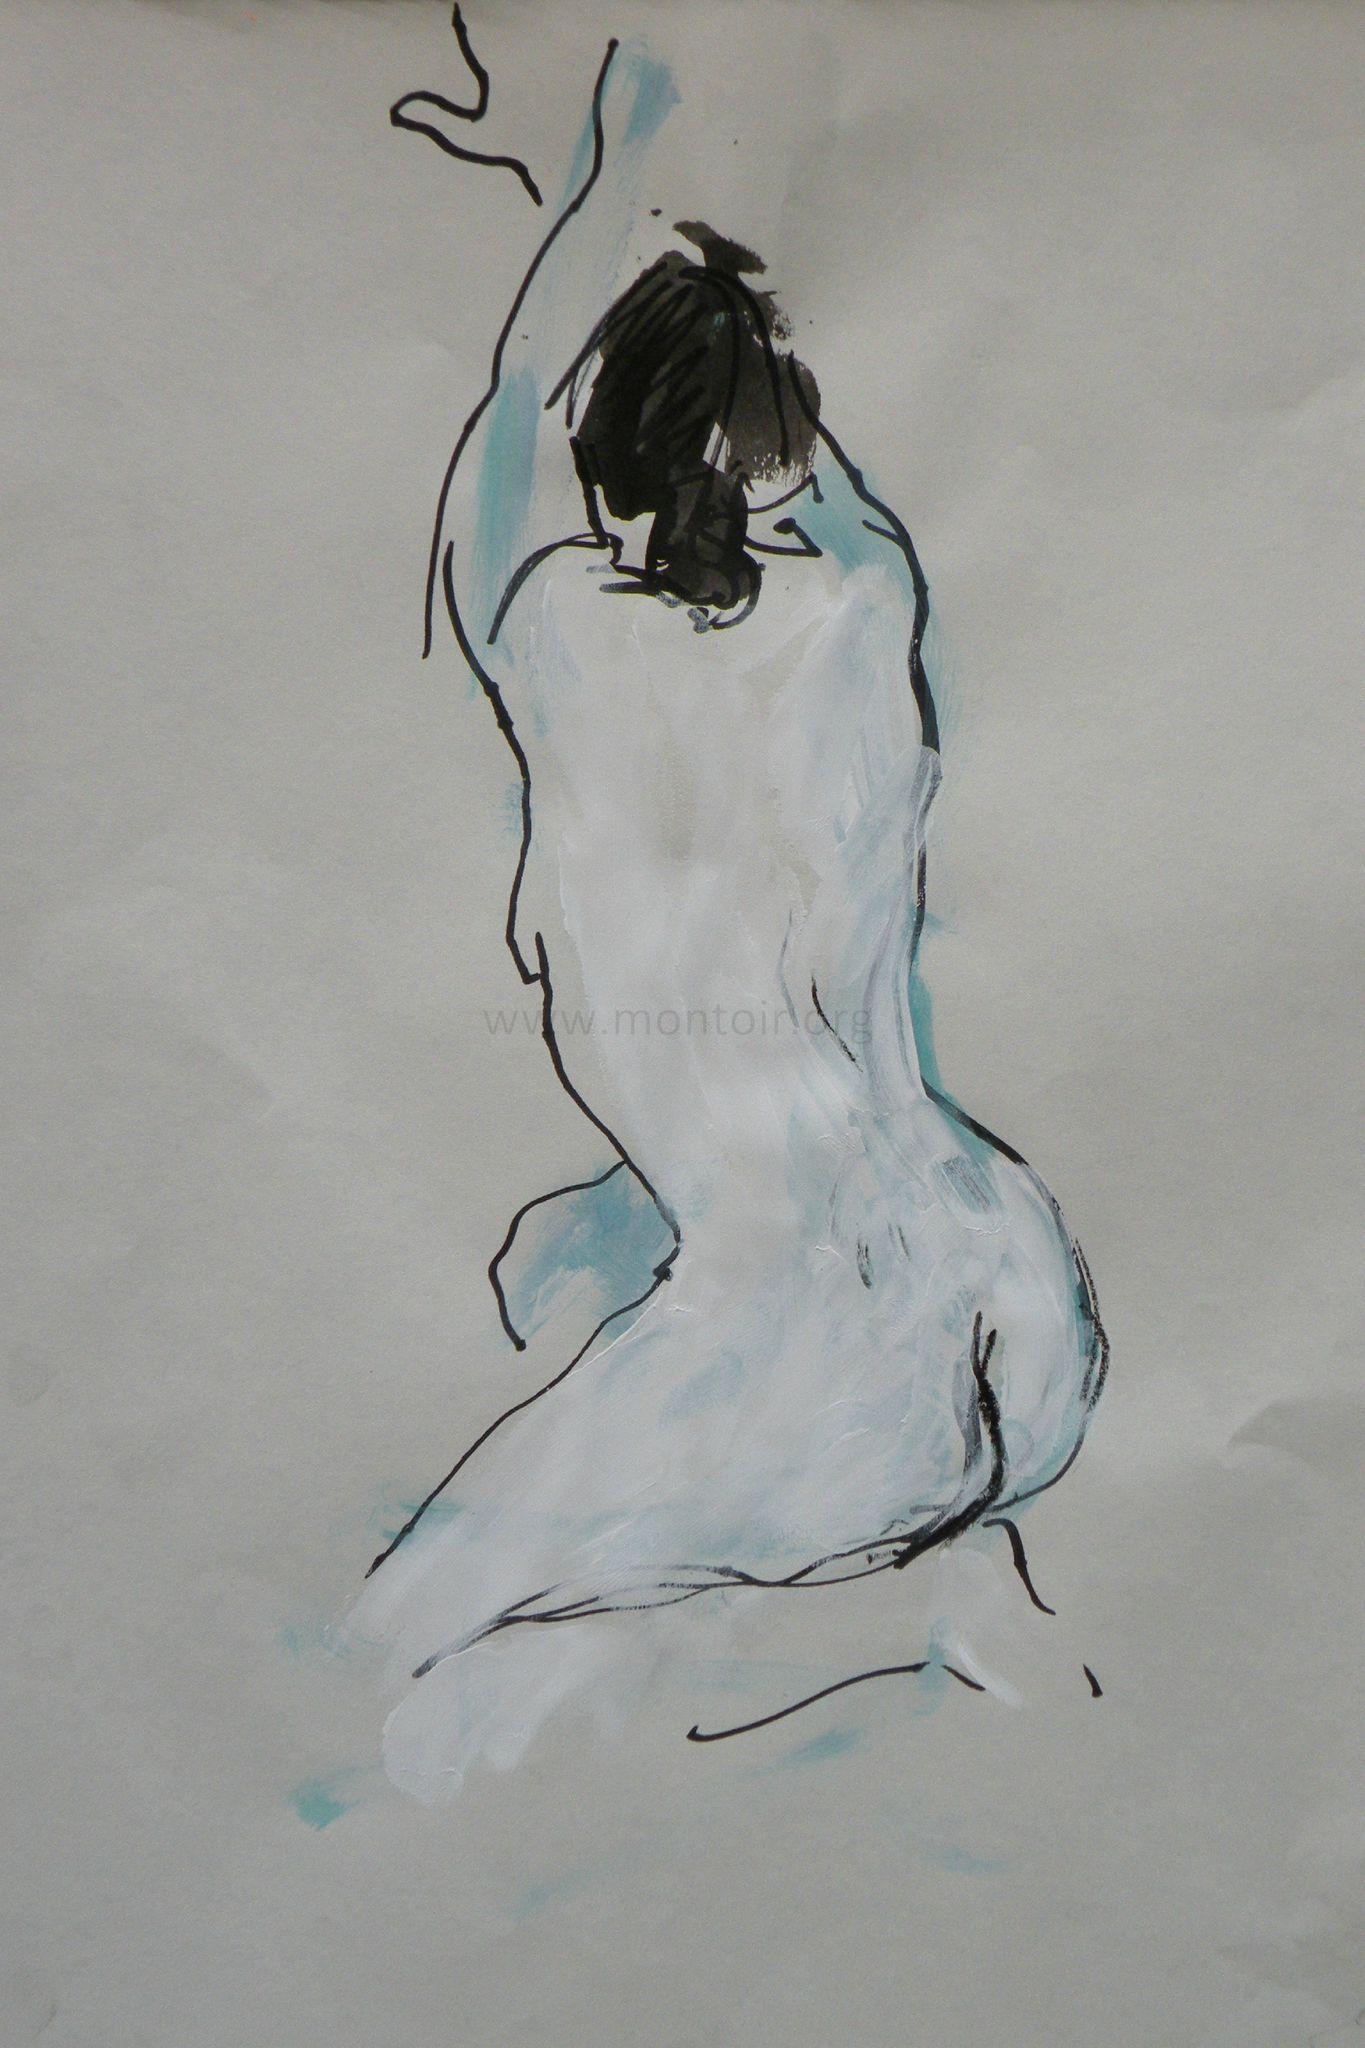 Alain Montoir Peintre de nus (3)